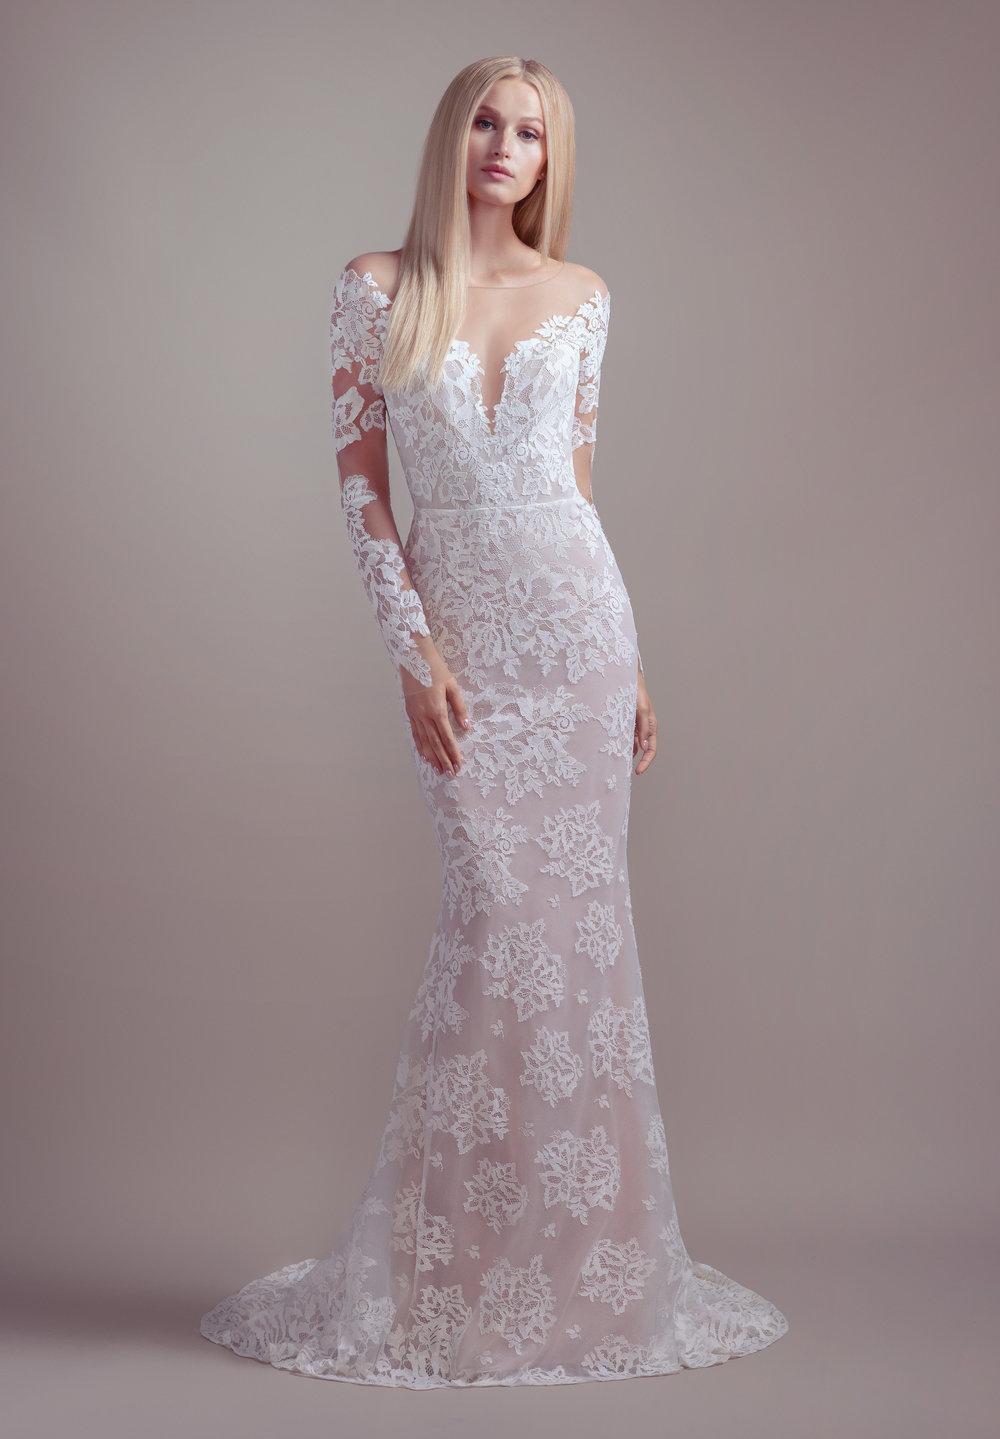 blush-hayley-paige-bridal-spring-2019-style-1906-jameson_1.jpg